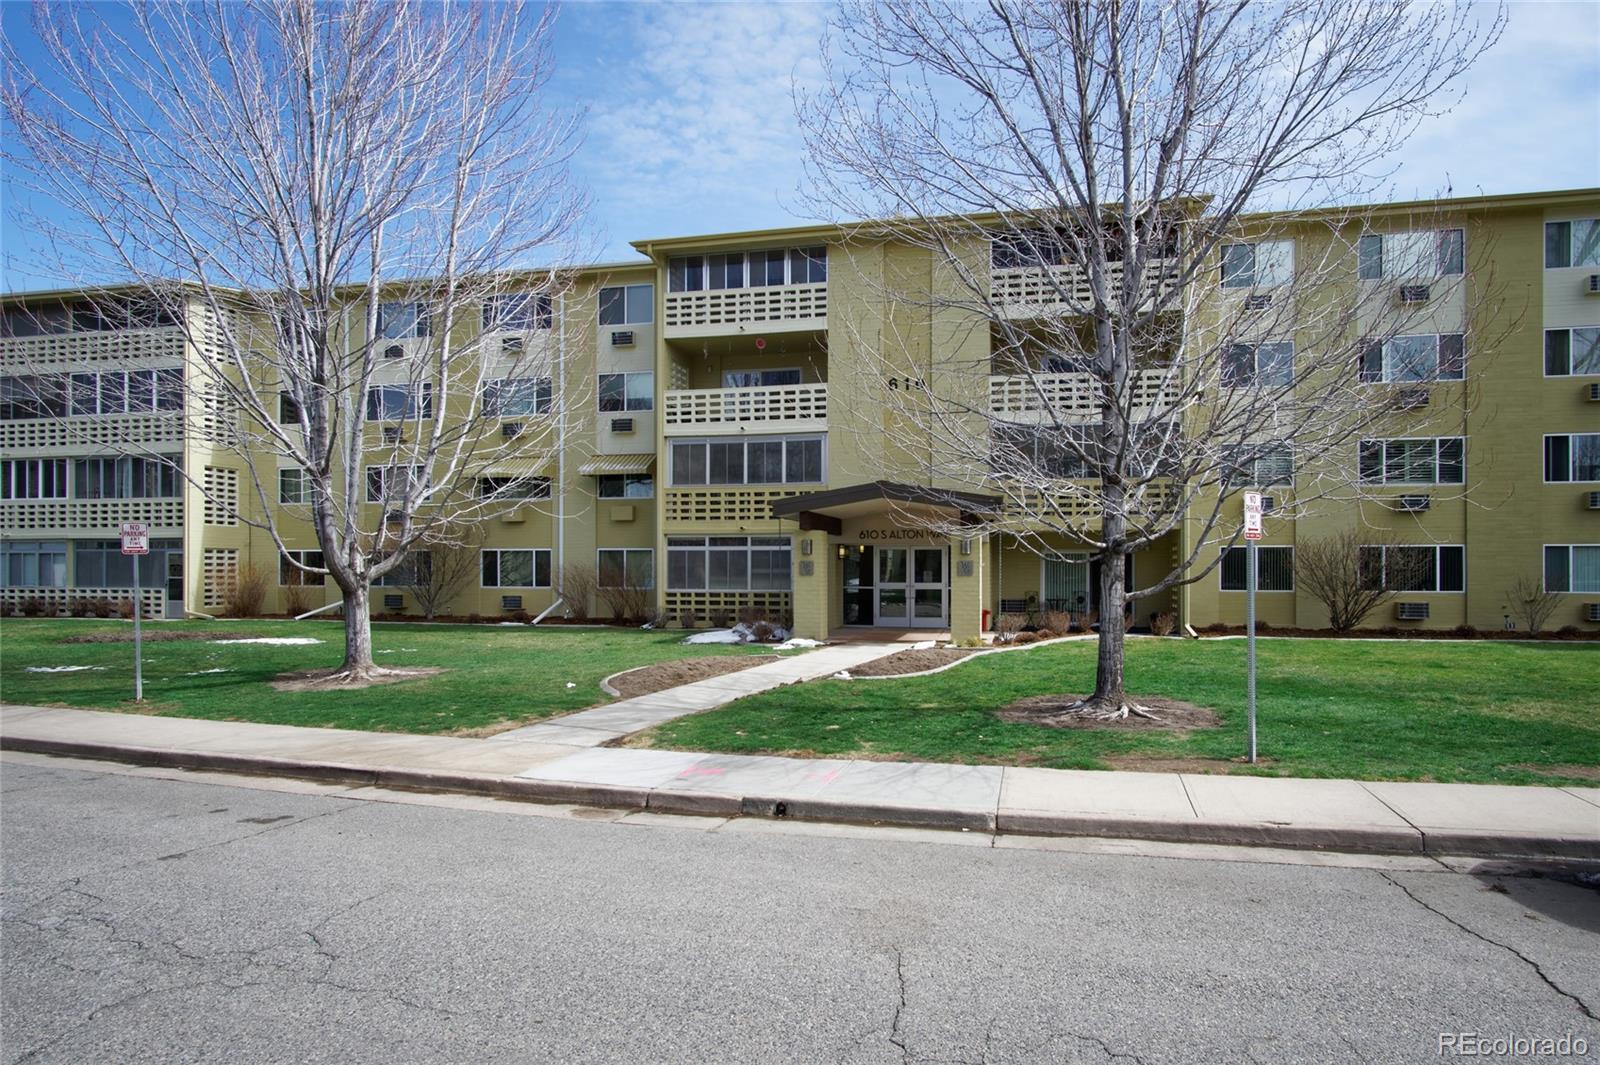 MLS# 3287239 - 2 - 610 S Alton Way #3A, Denver, CO 80247